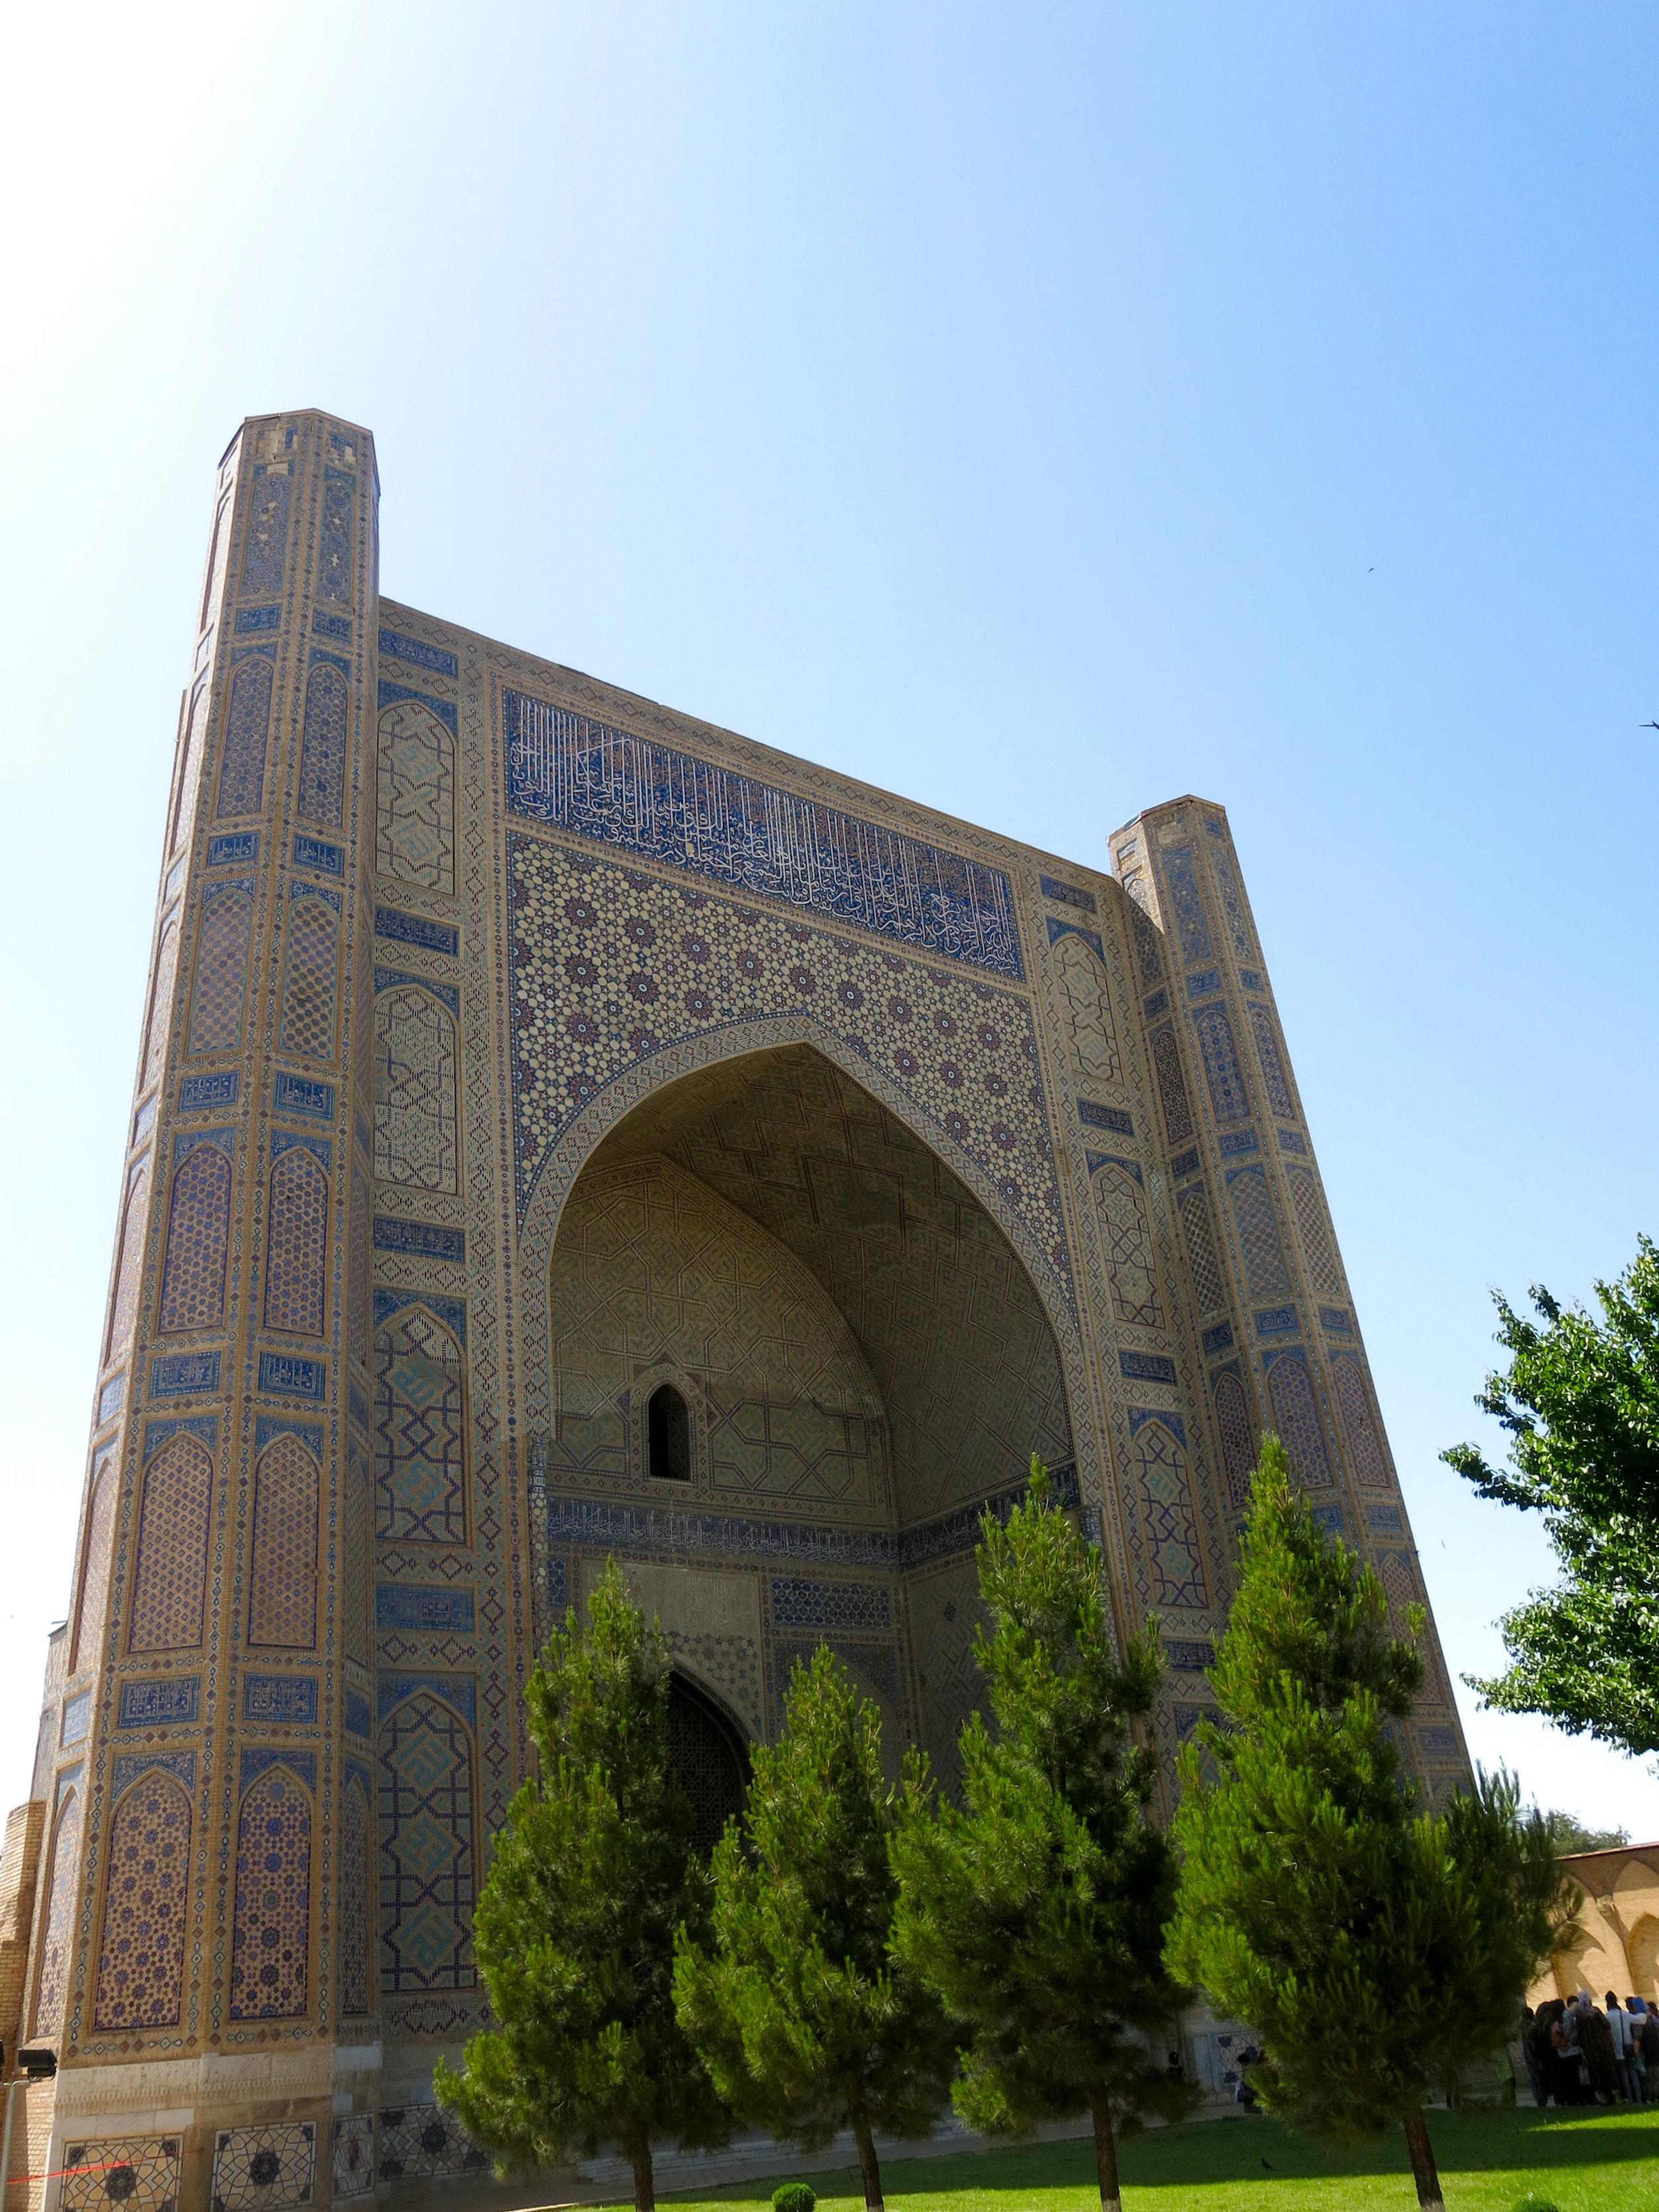 The gigantic entrance hall of Bibi-Khanym mosque